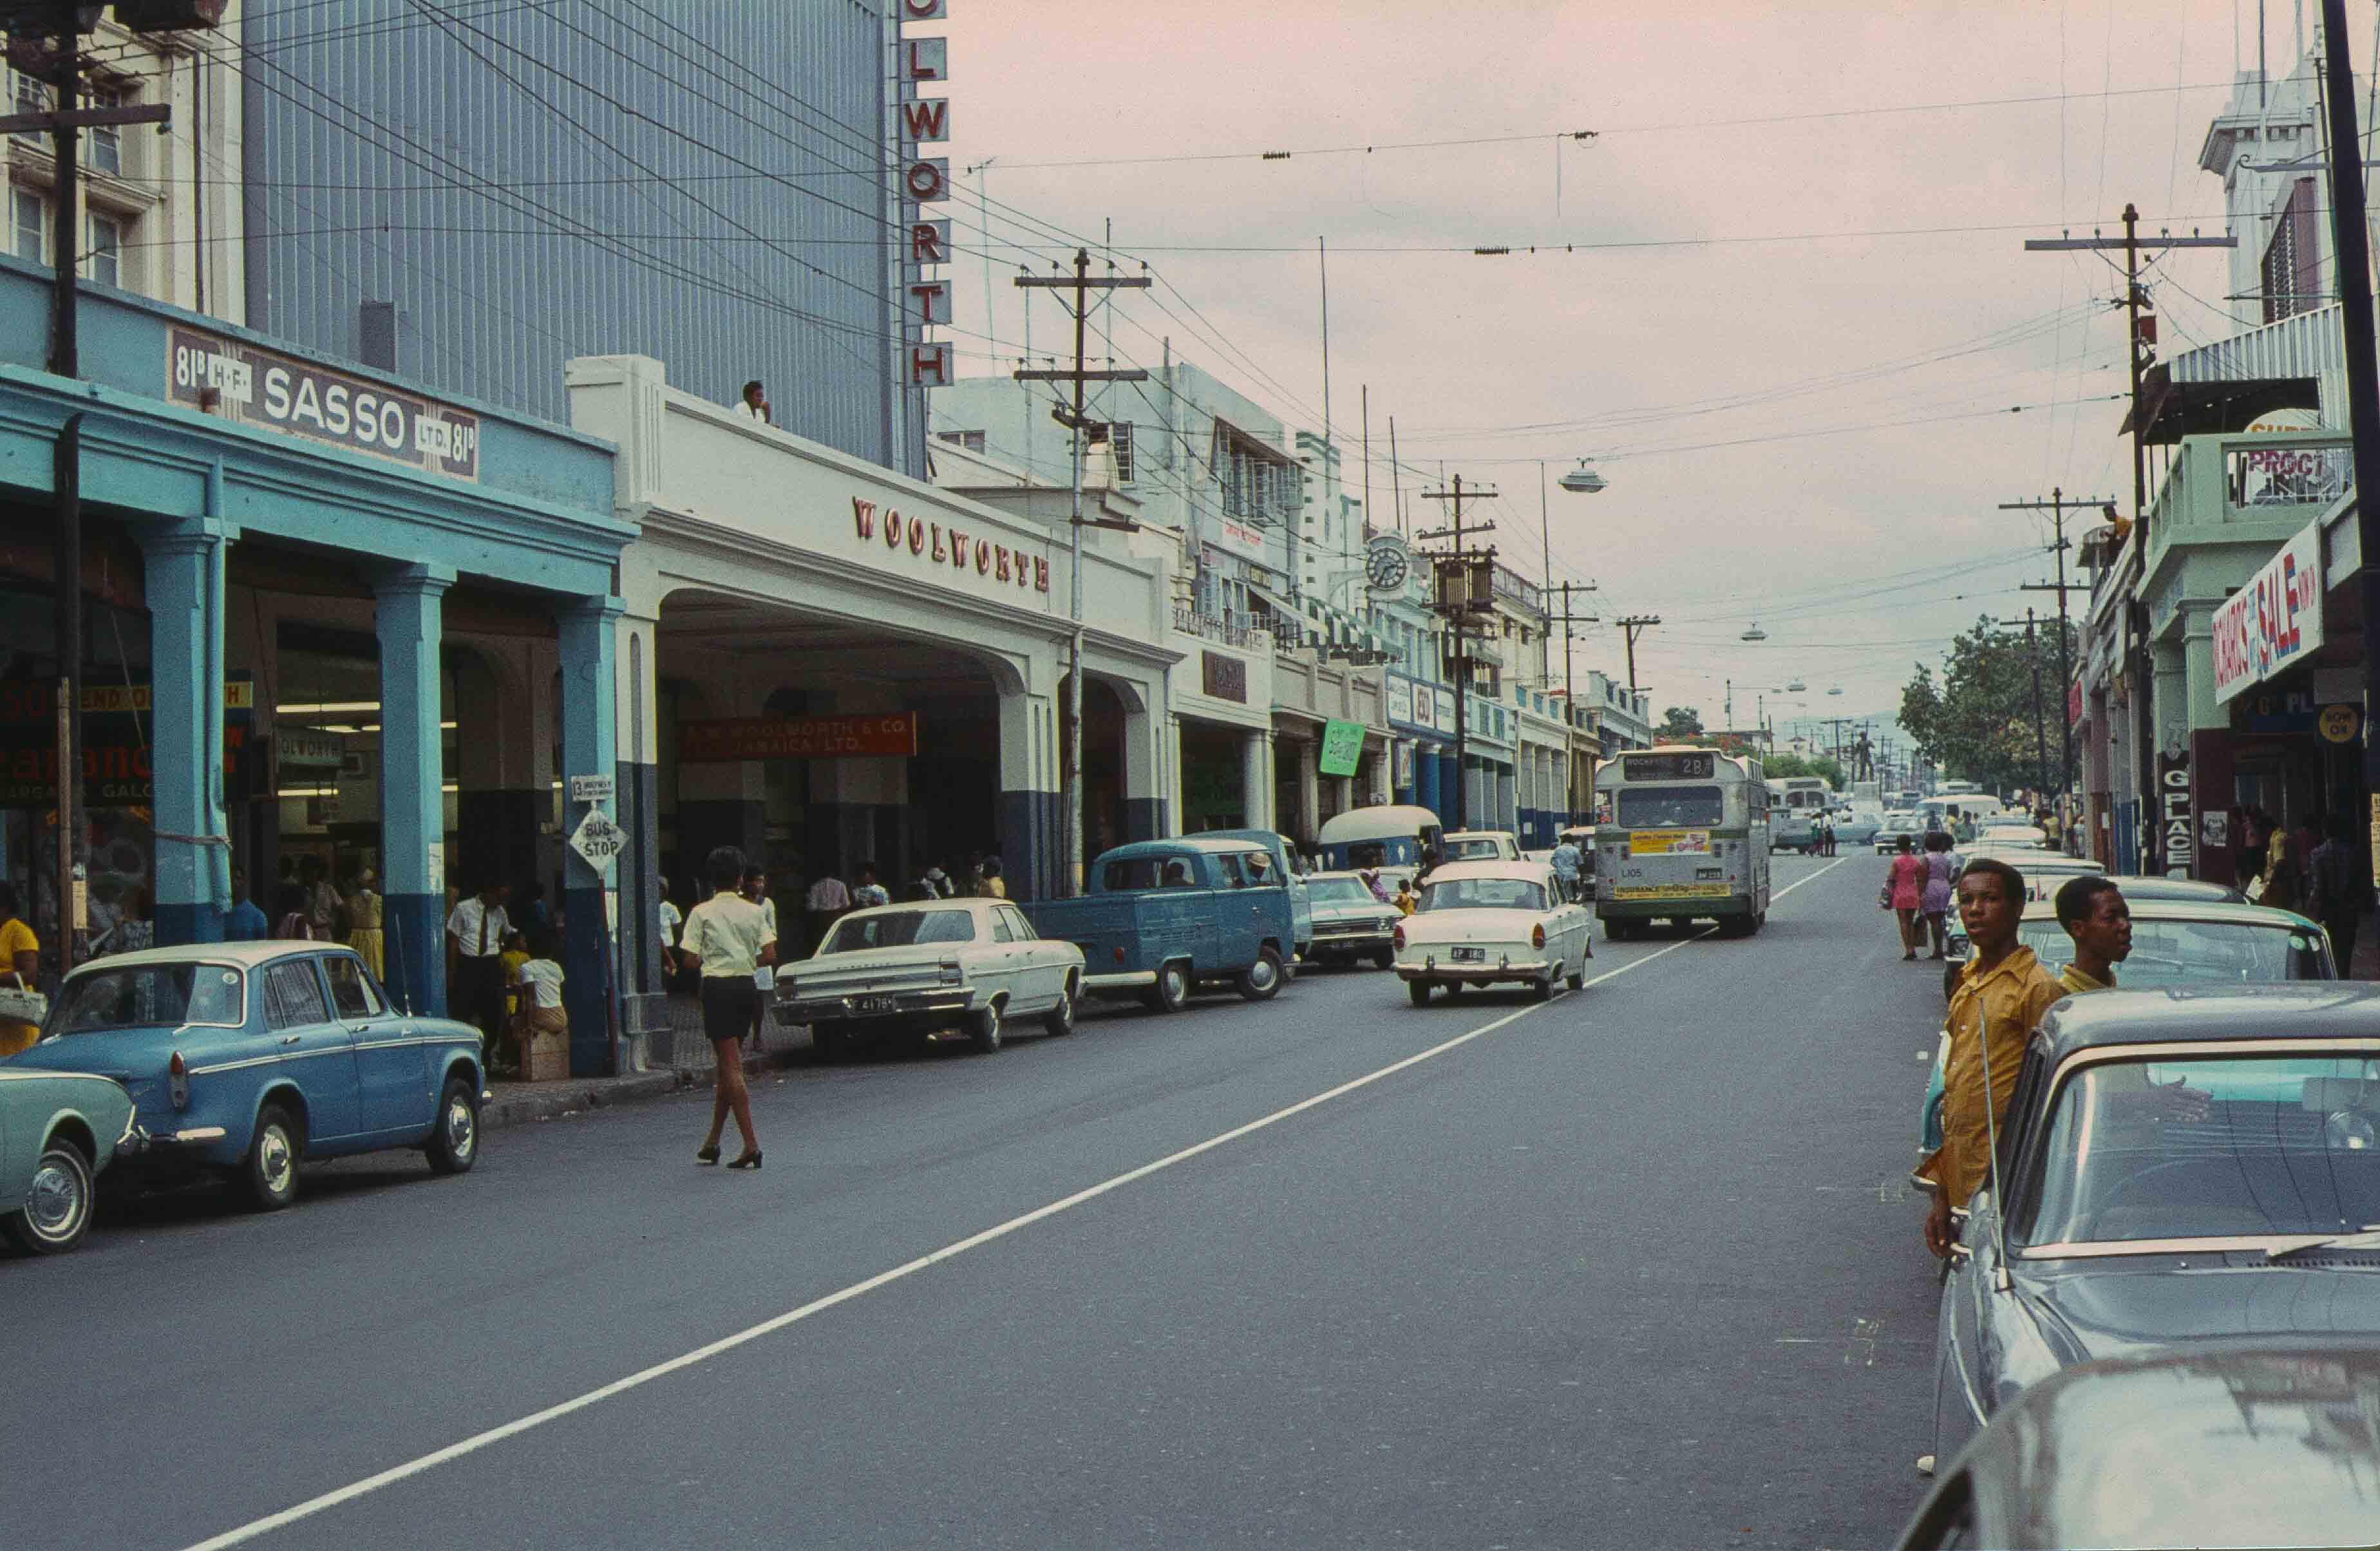 668. Suriname